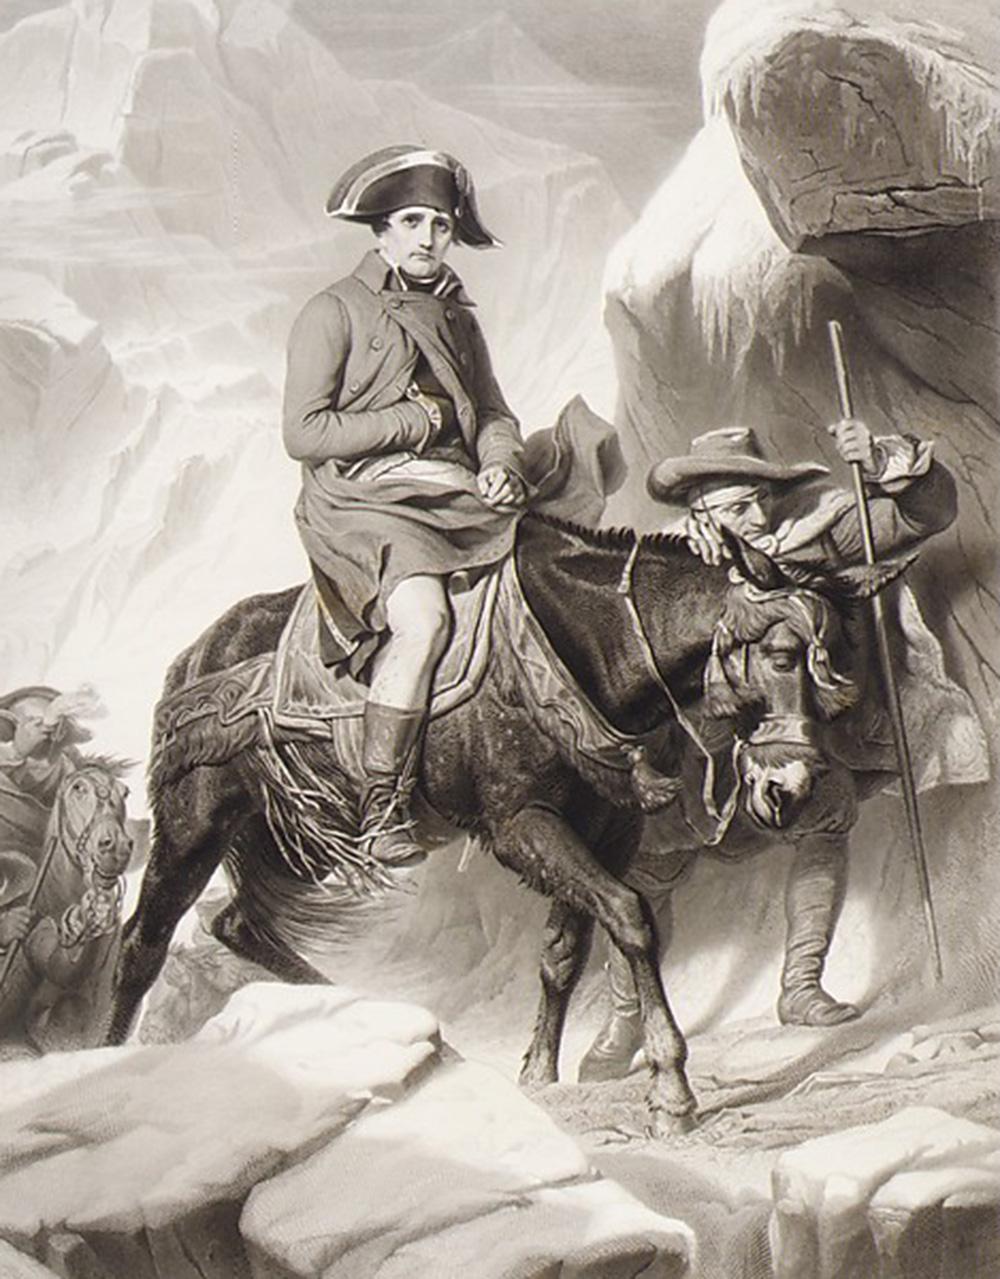 Napoleon Crossing the Alps, by Alphonse François, 1851. The Metropolitan Museum of Art, The Elisha Whittelsey Collection, The Elisha Whittelsey Fund, 1949.